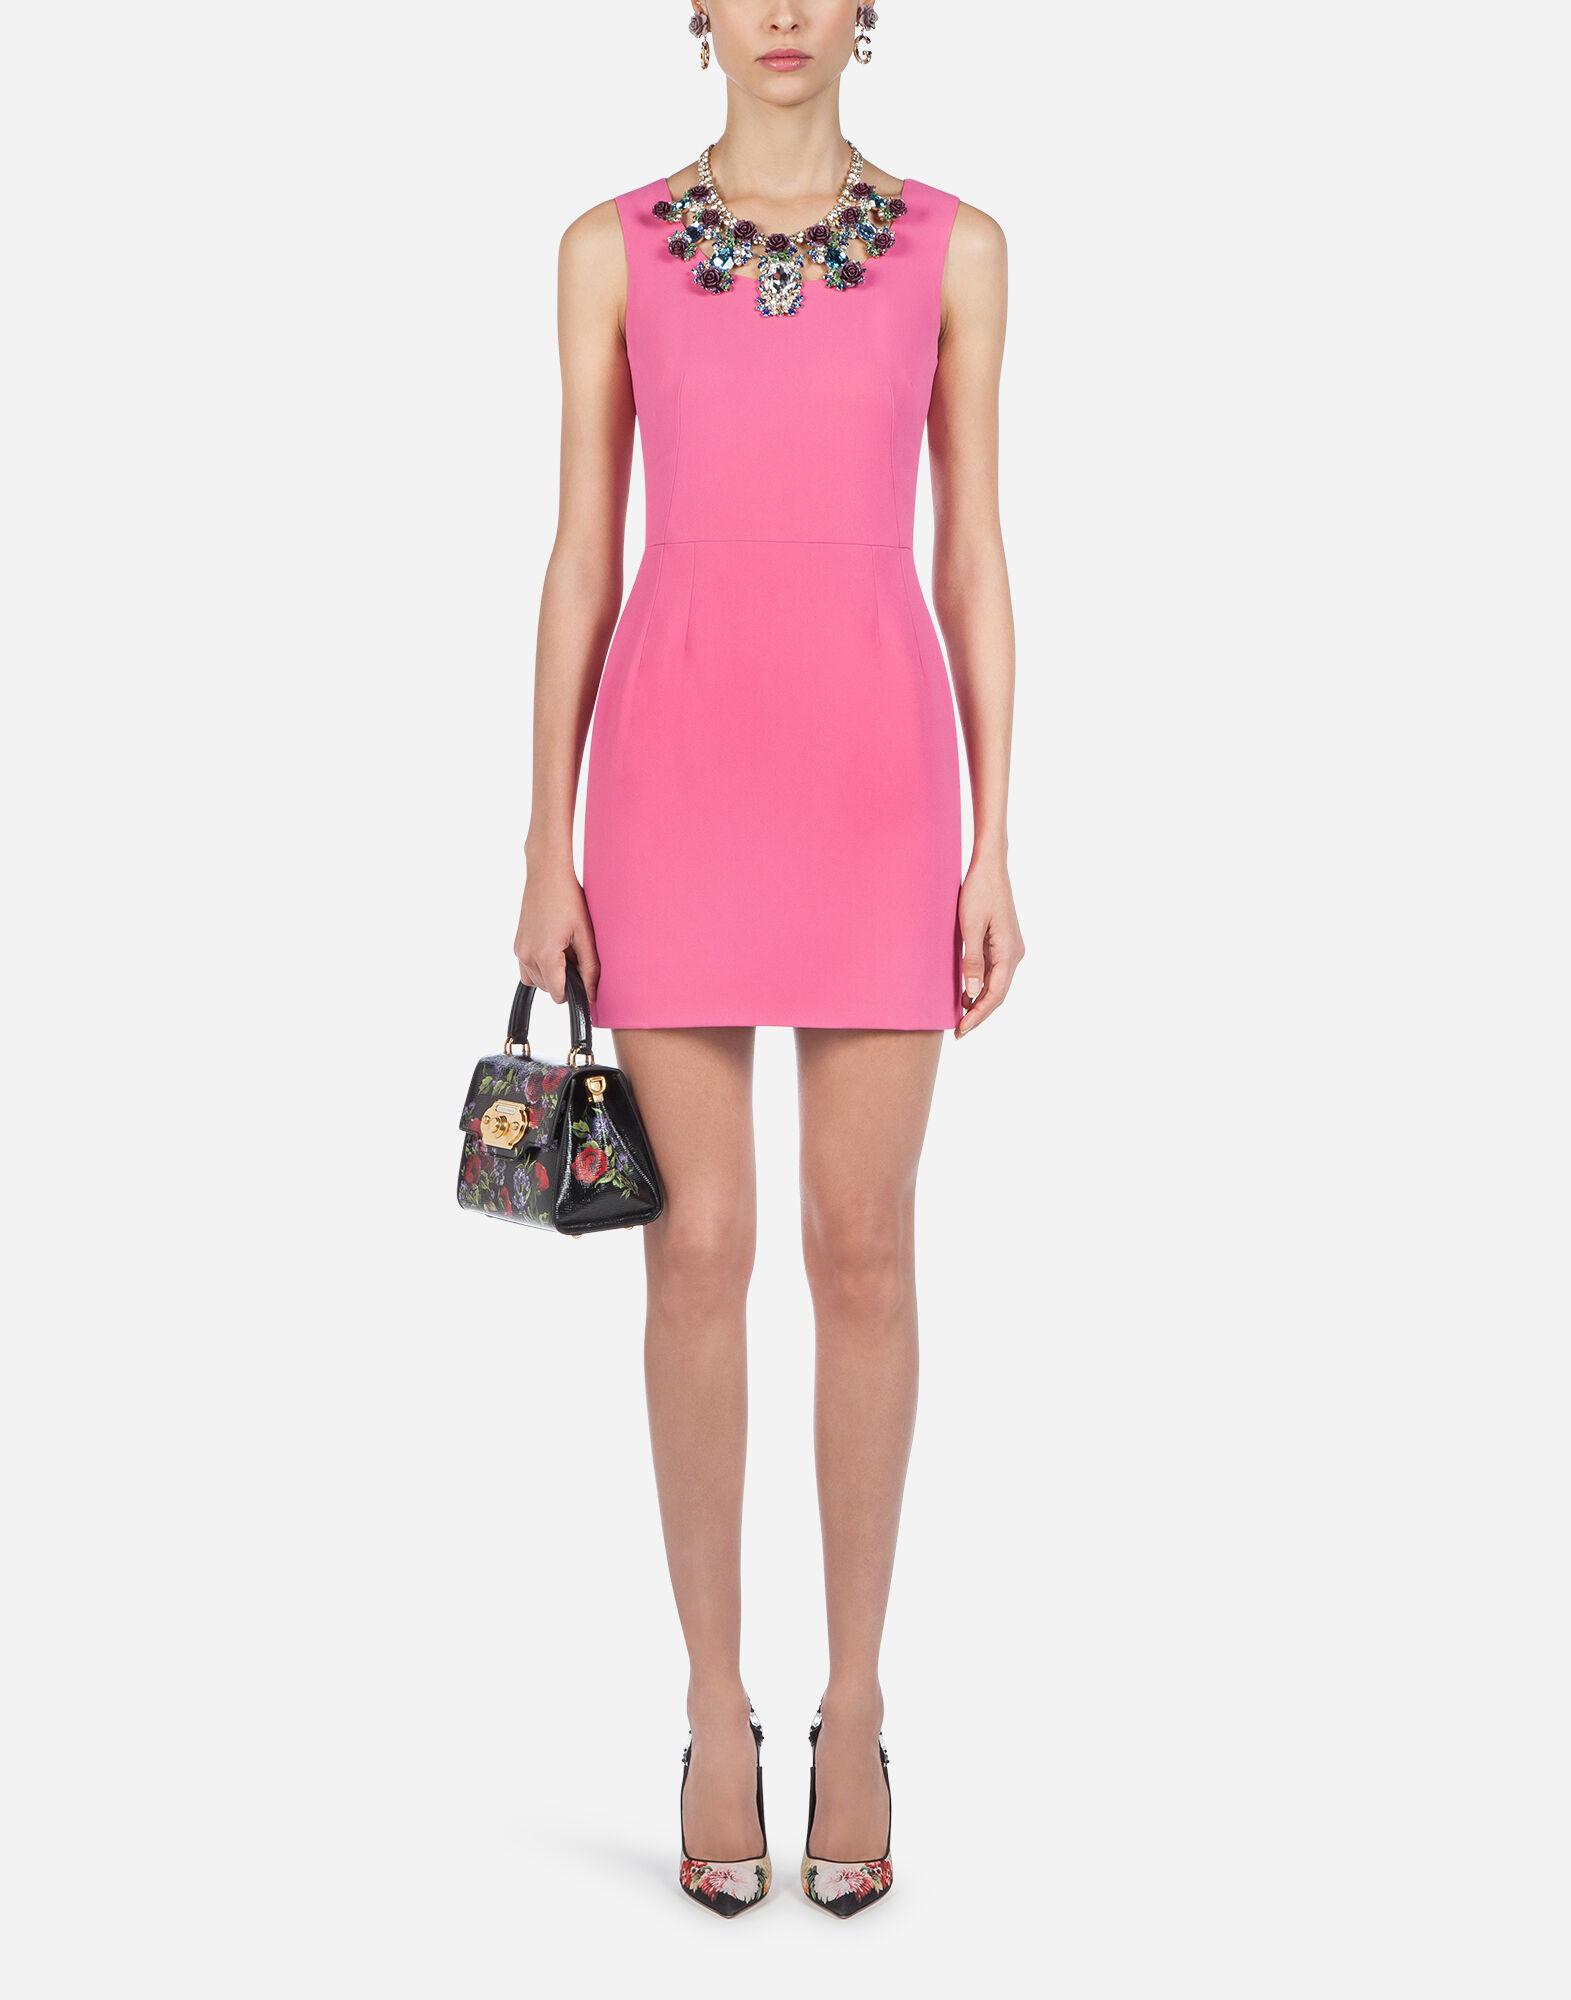 Colección Vestidos Dolce Nueva Mujer amp;gabbana vqwqgFnBxU